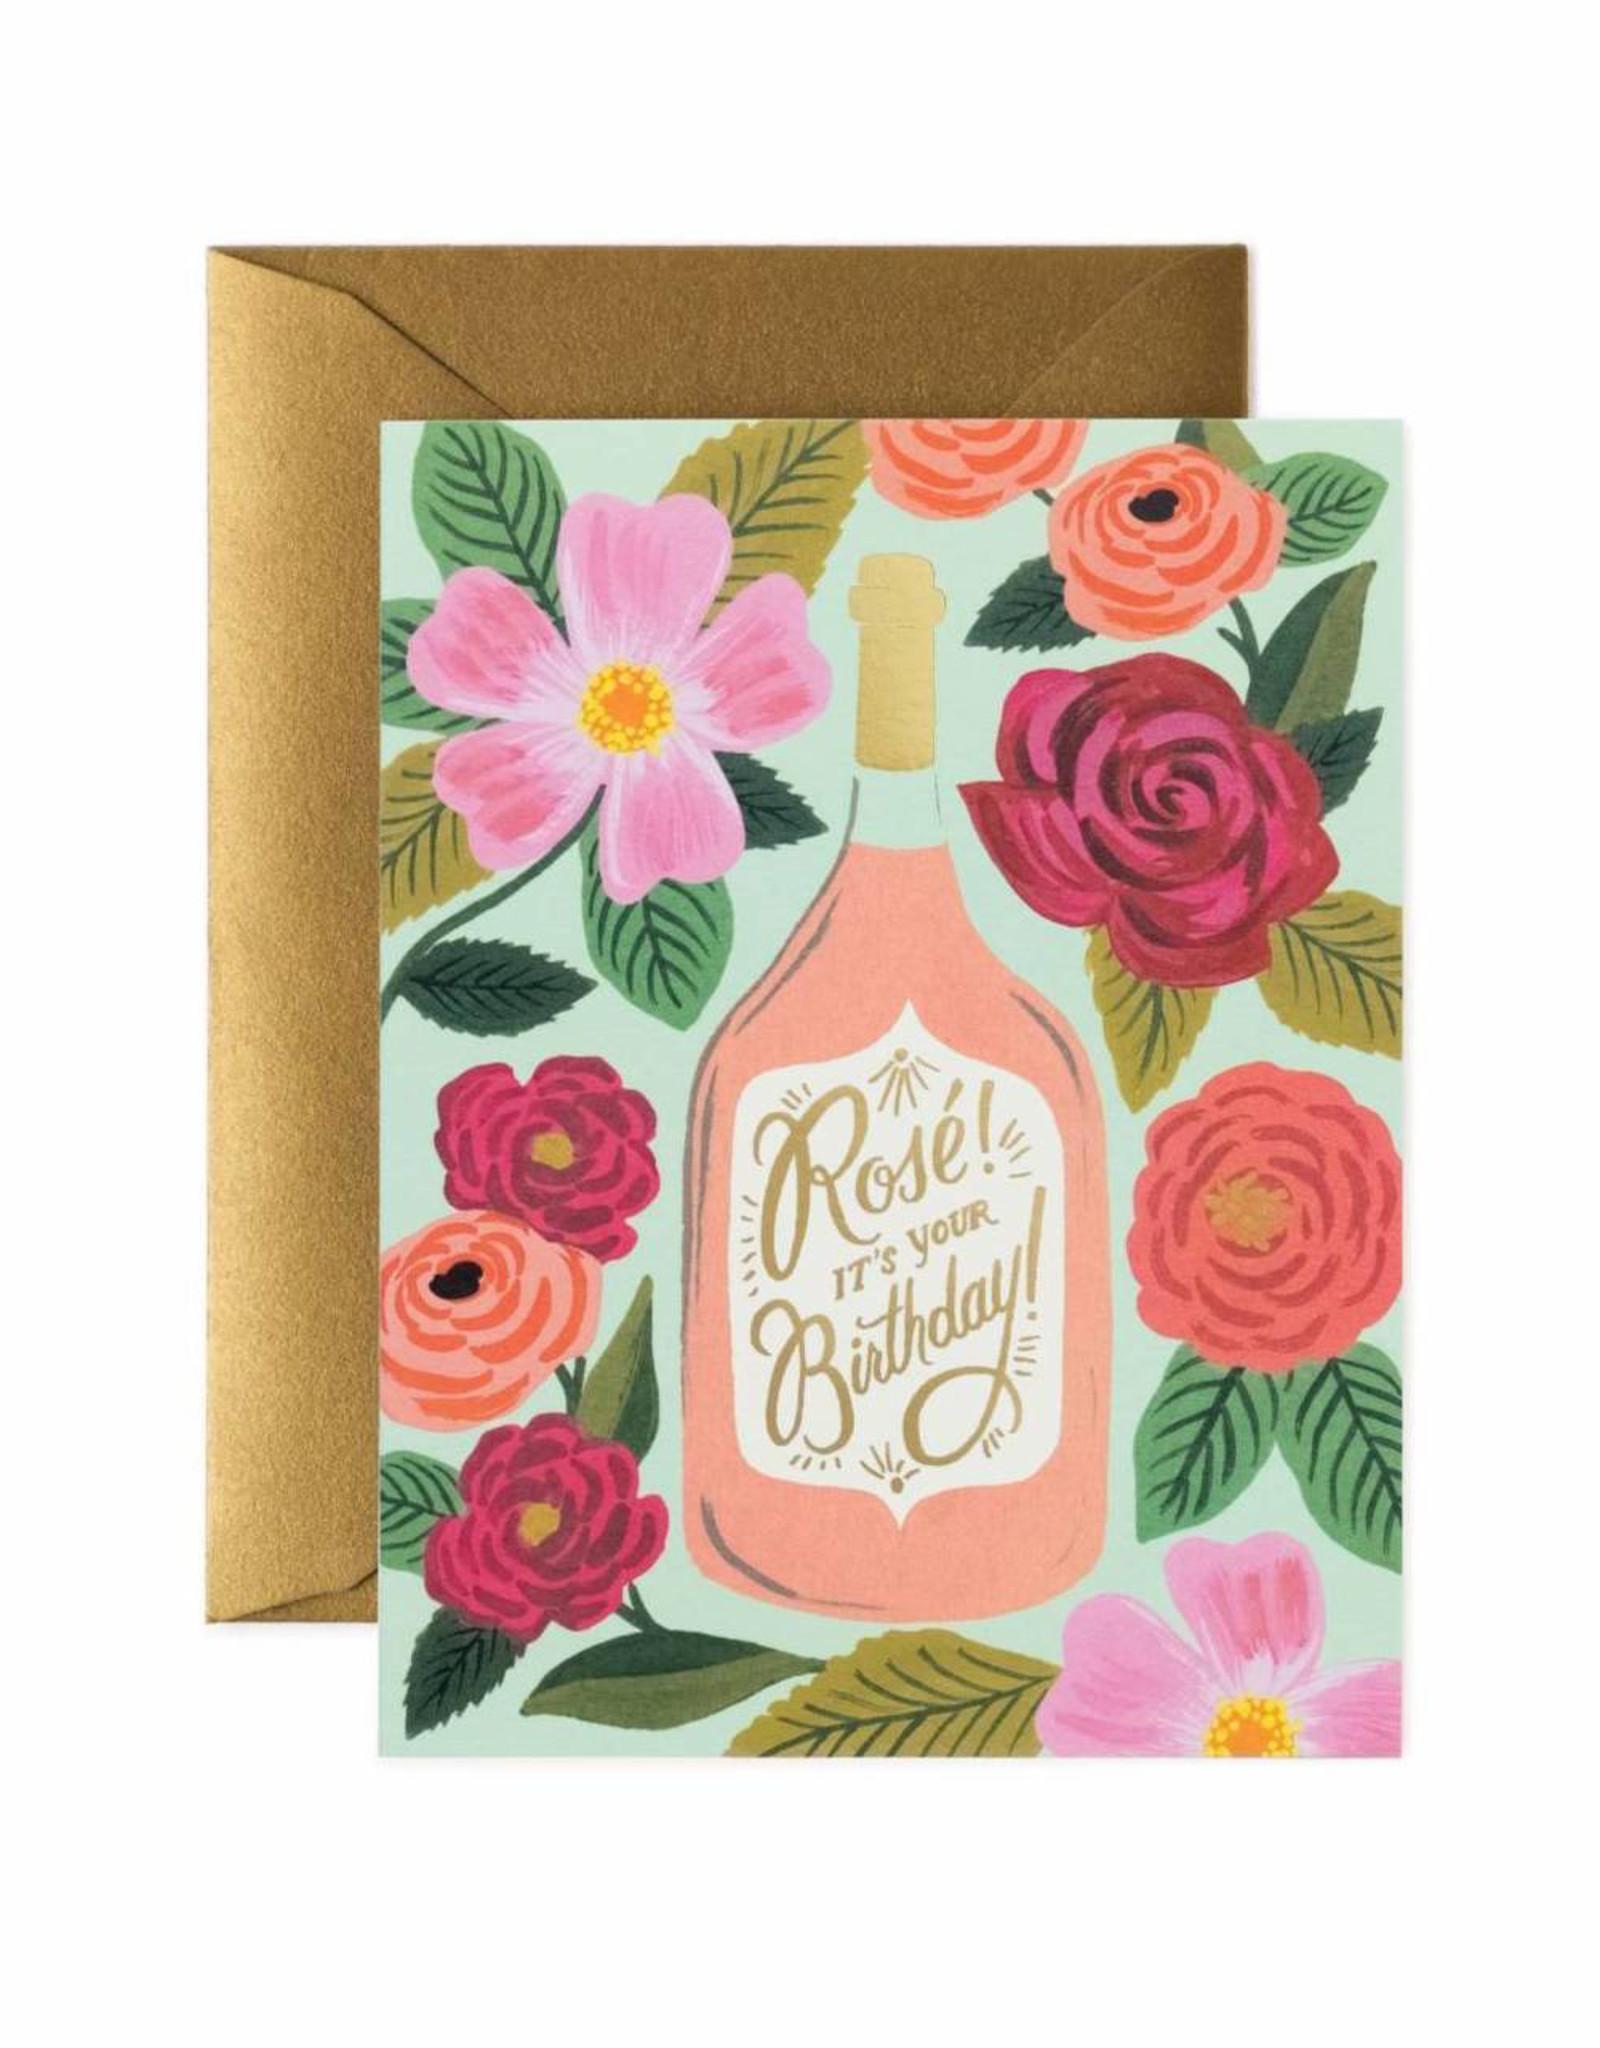 Rosé it's Your Birthday Card